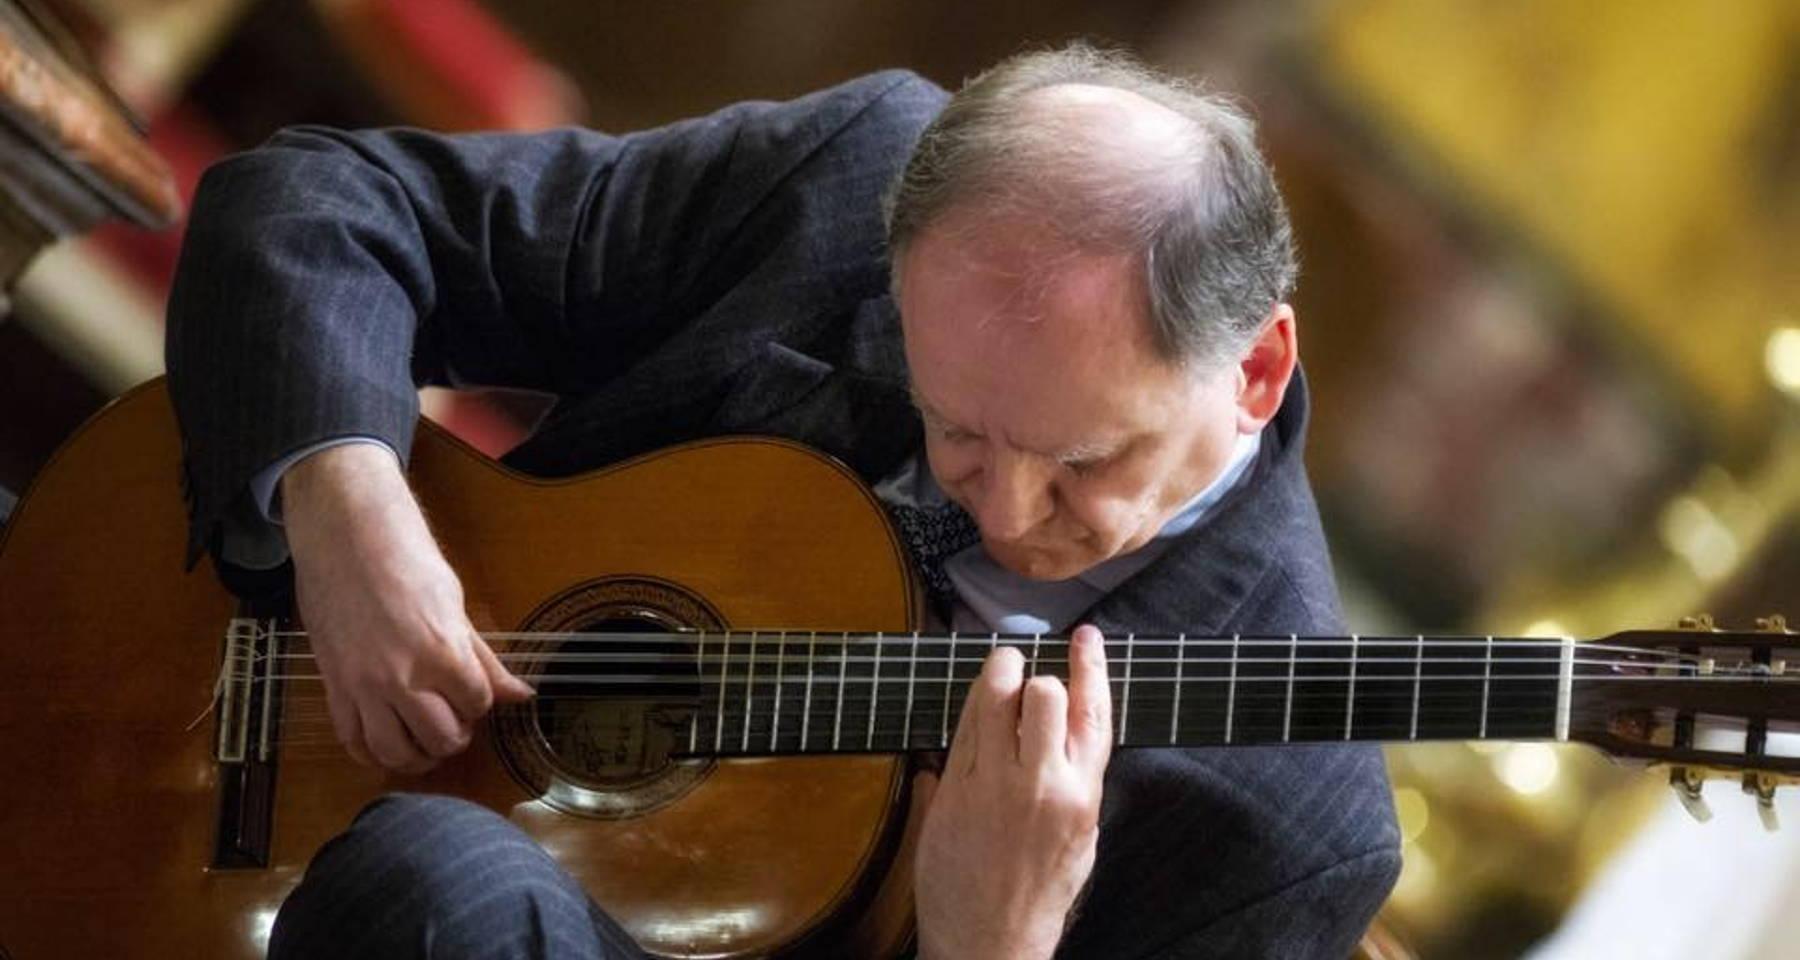 ASMI Presents: Prof.Bonaguri - '20 Studies for Guitar' by Sor edited by Segovia